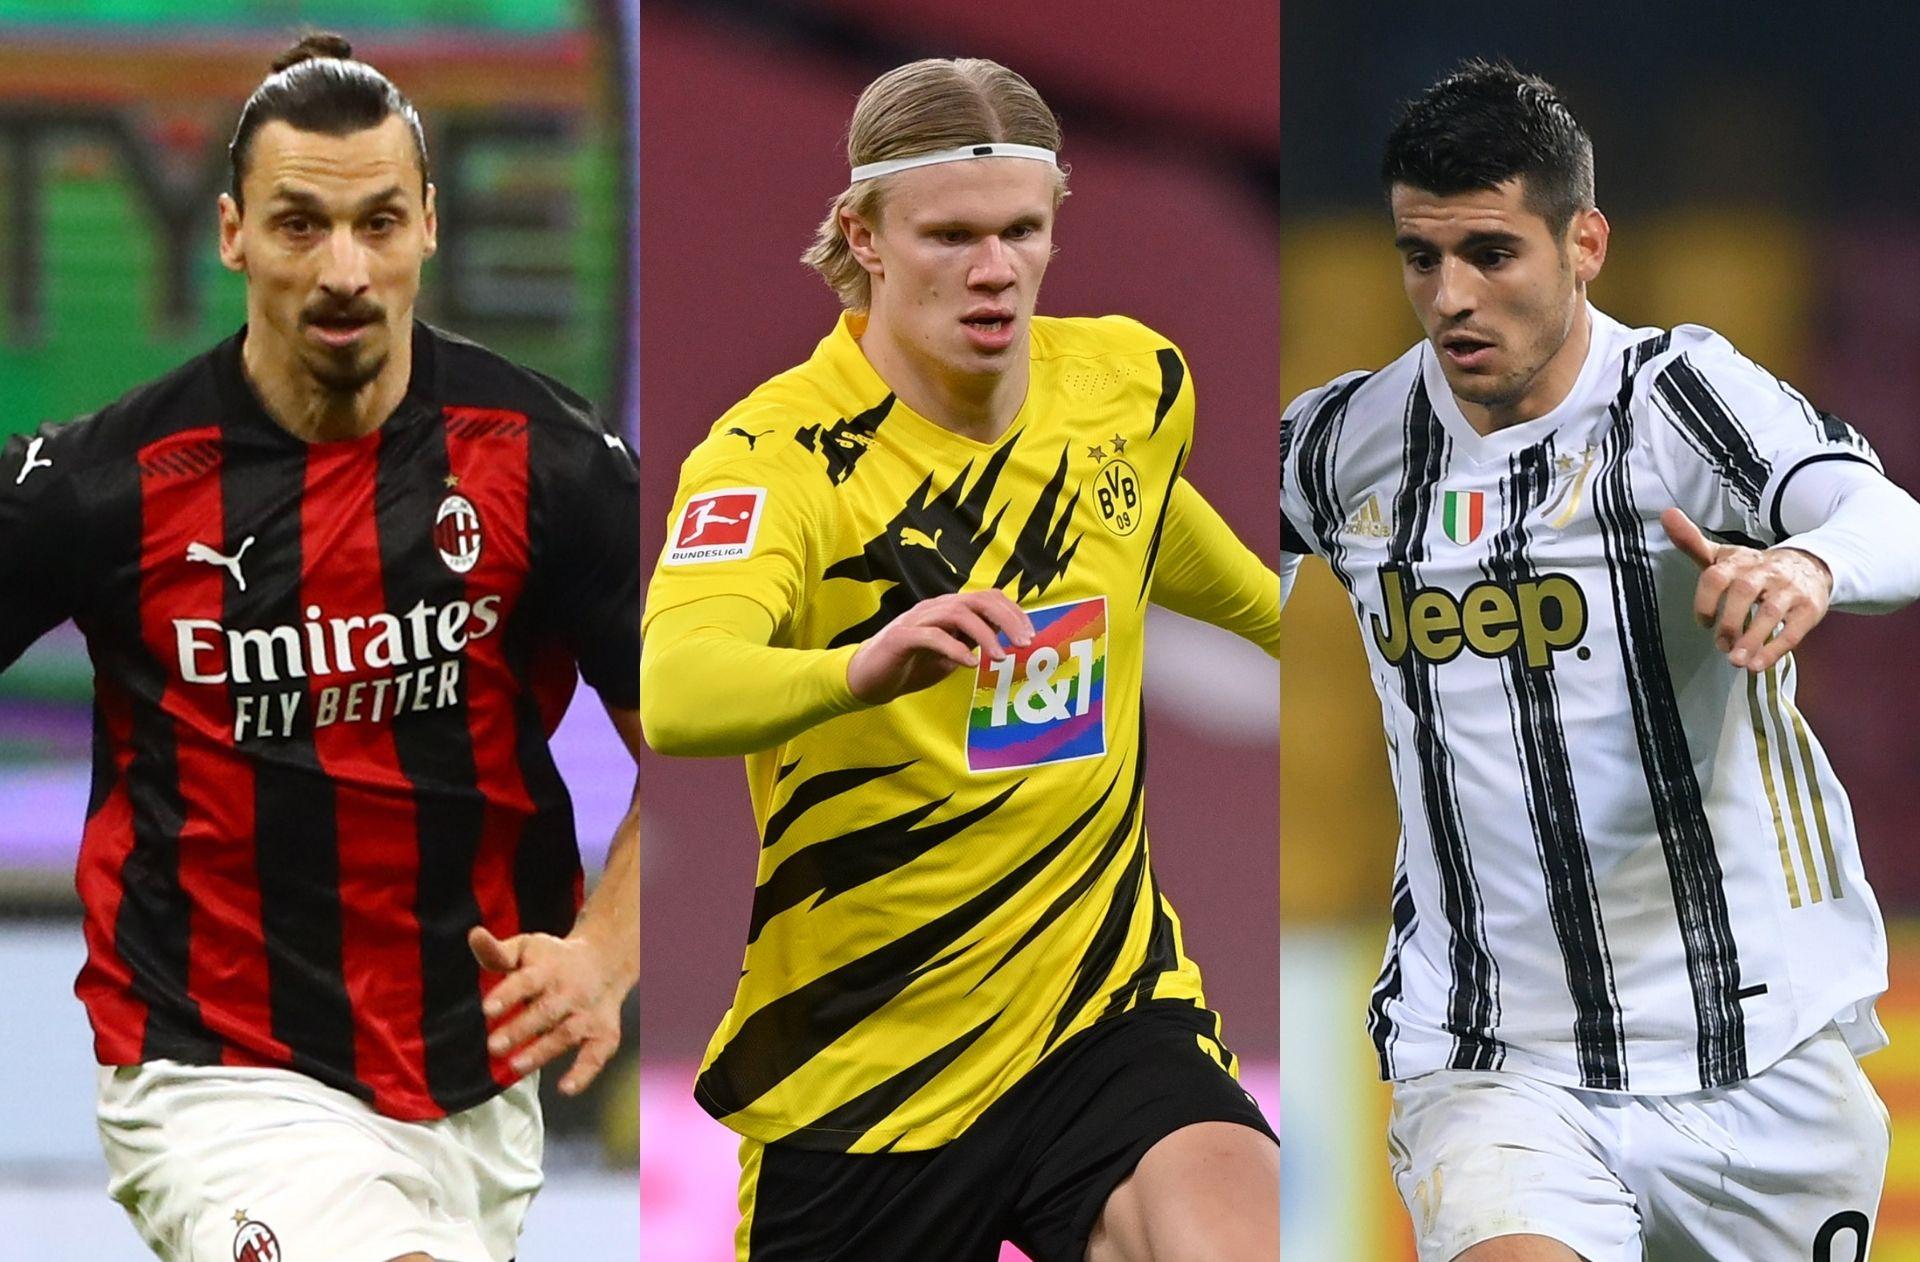 Zlatan Ibrahimovic of AC Milan, Erling Haaland of Borussia Dortmund, Alvaro Morata of Juventus